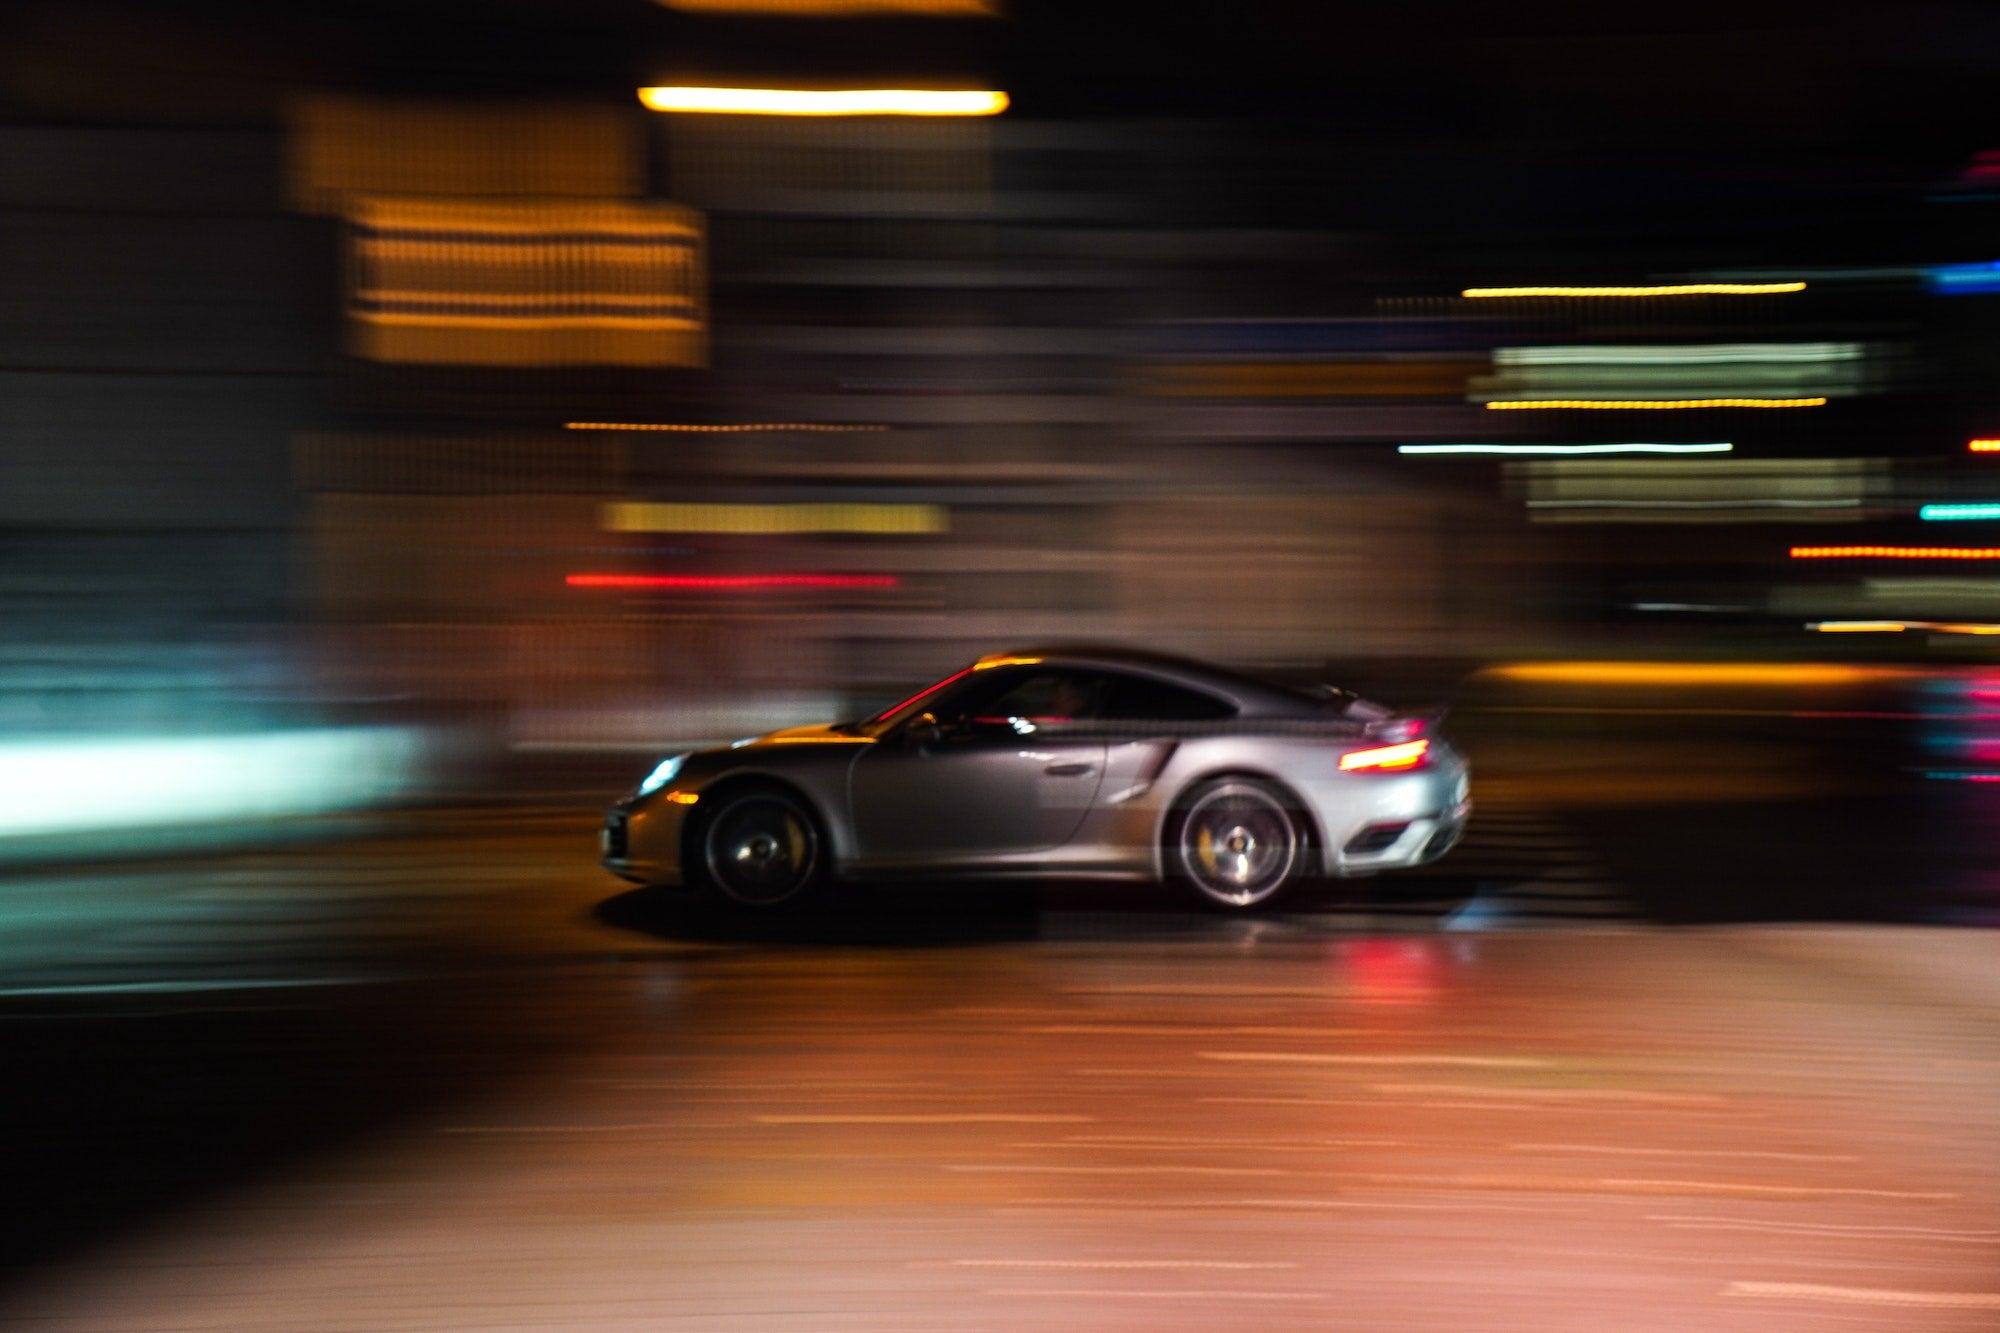 A speeding Porsche.